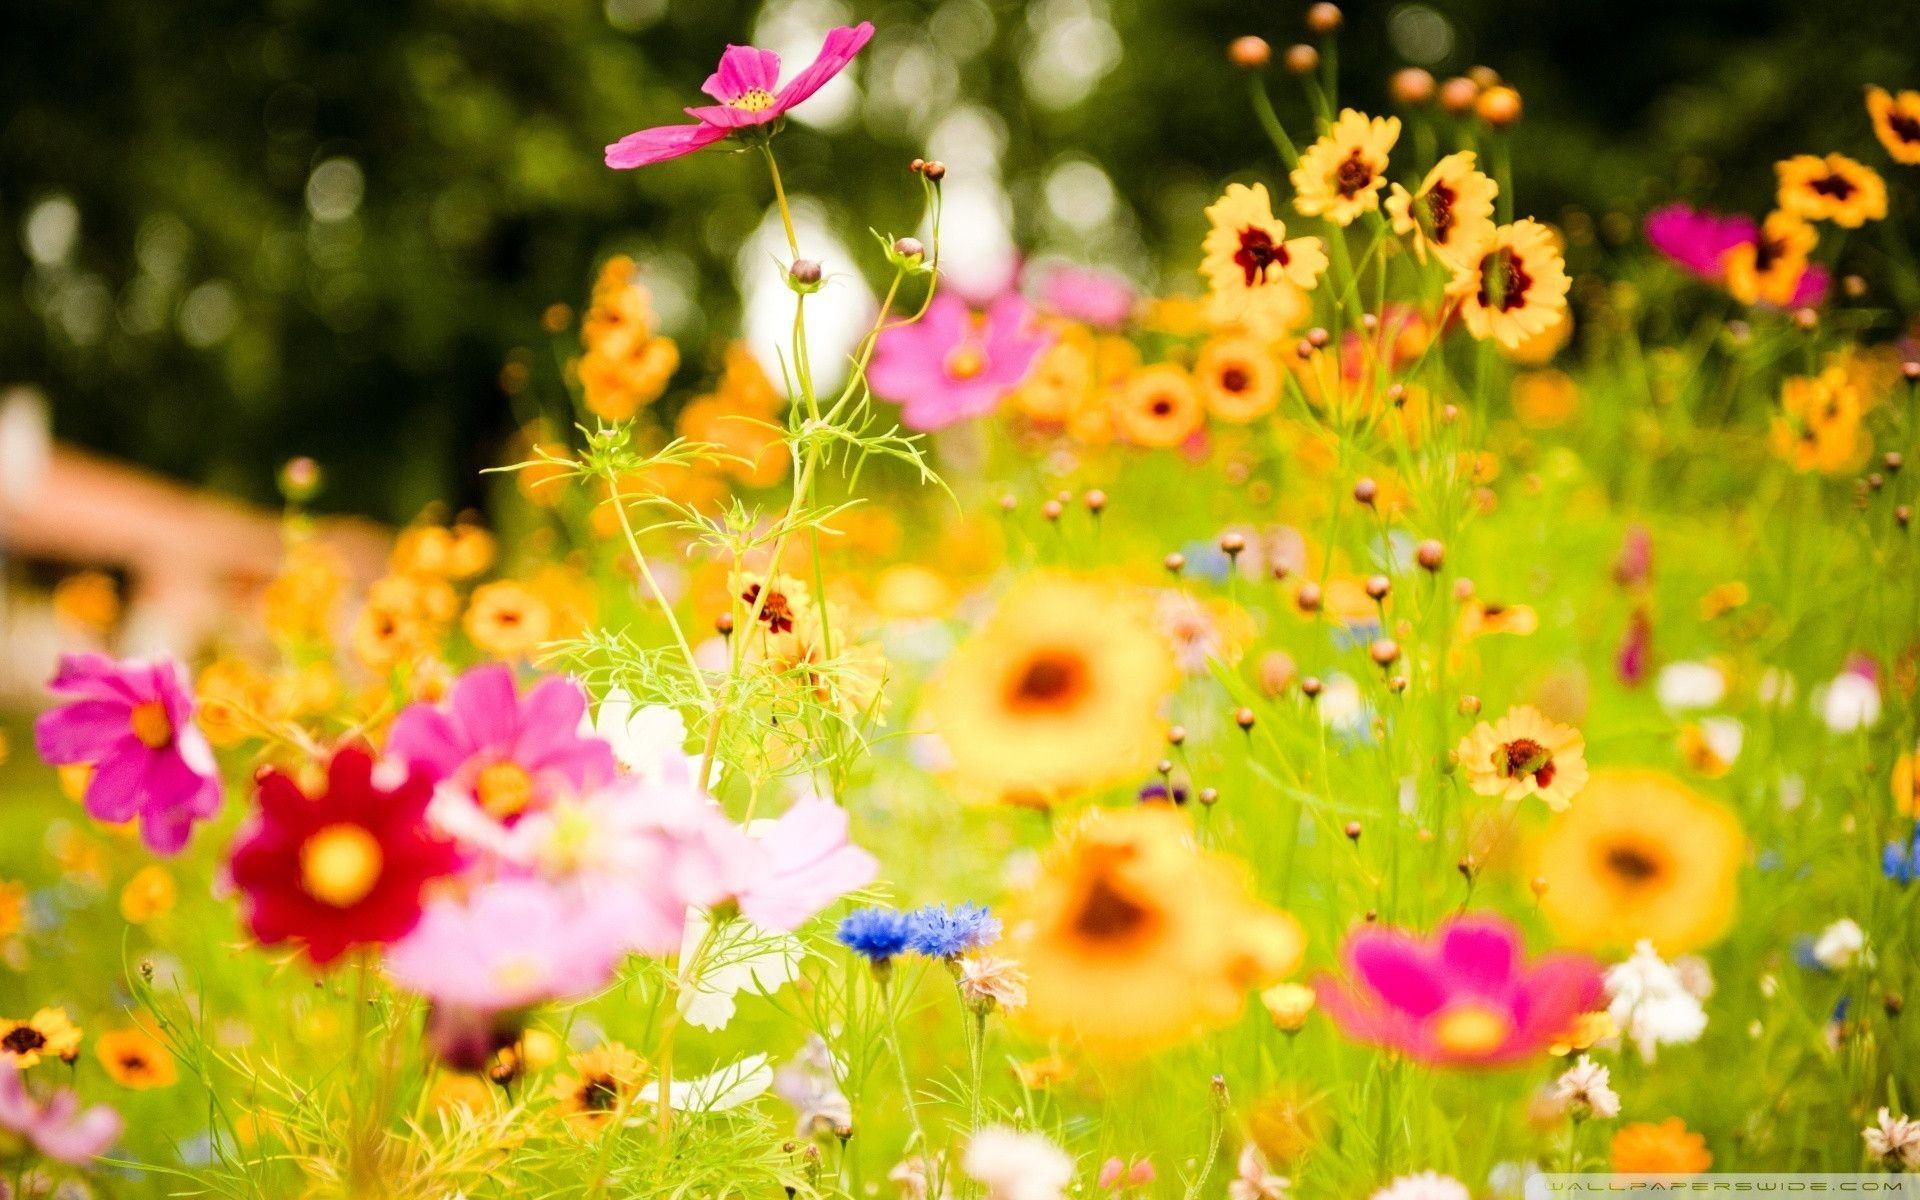 Summer Flower Wallpaper 66 Images